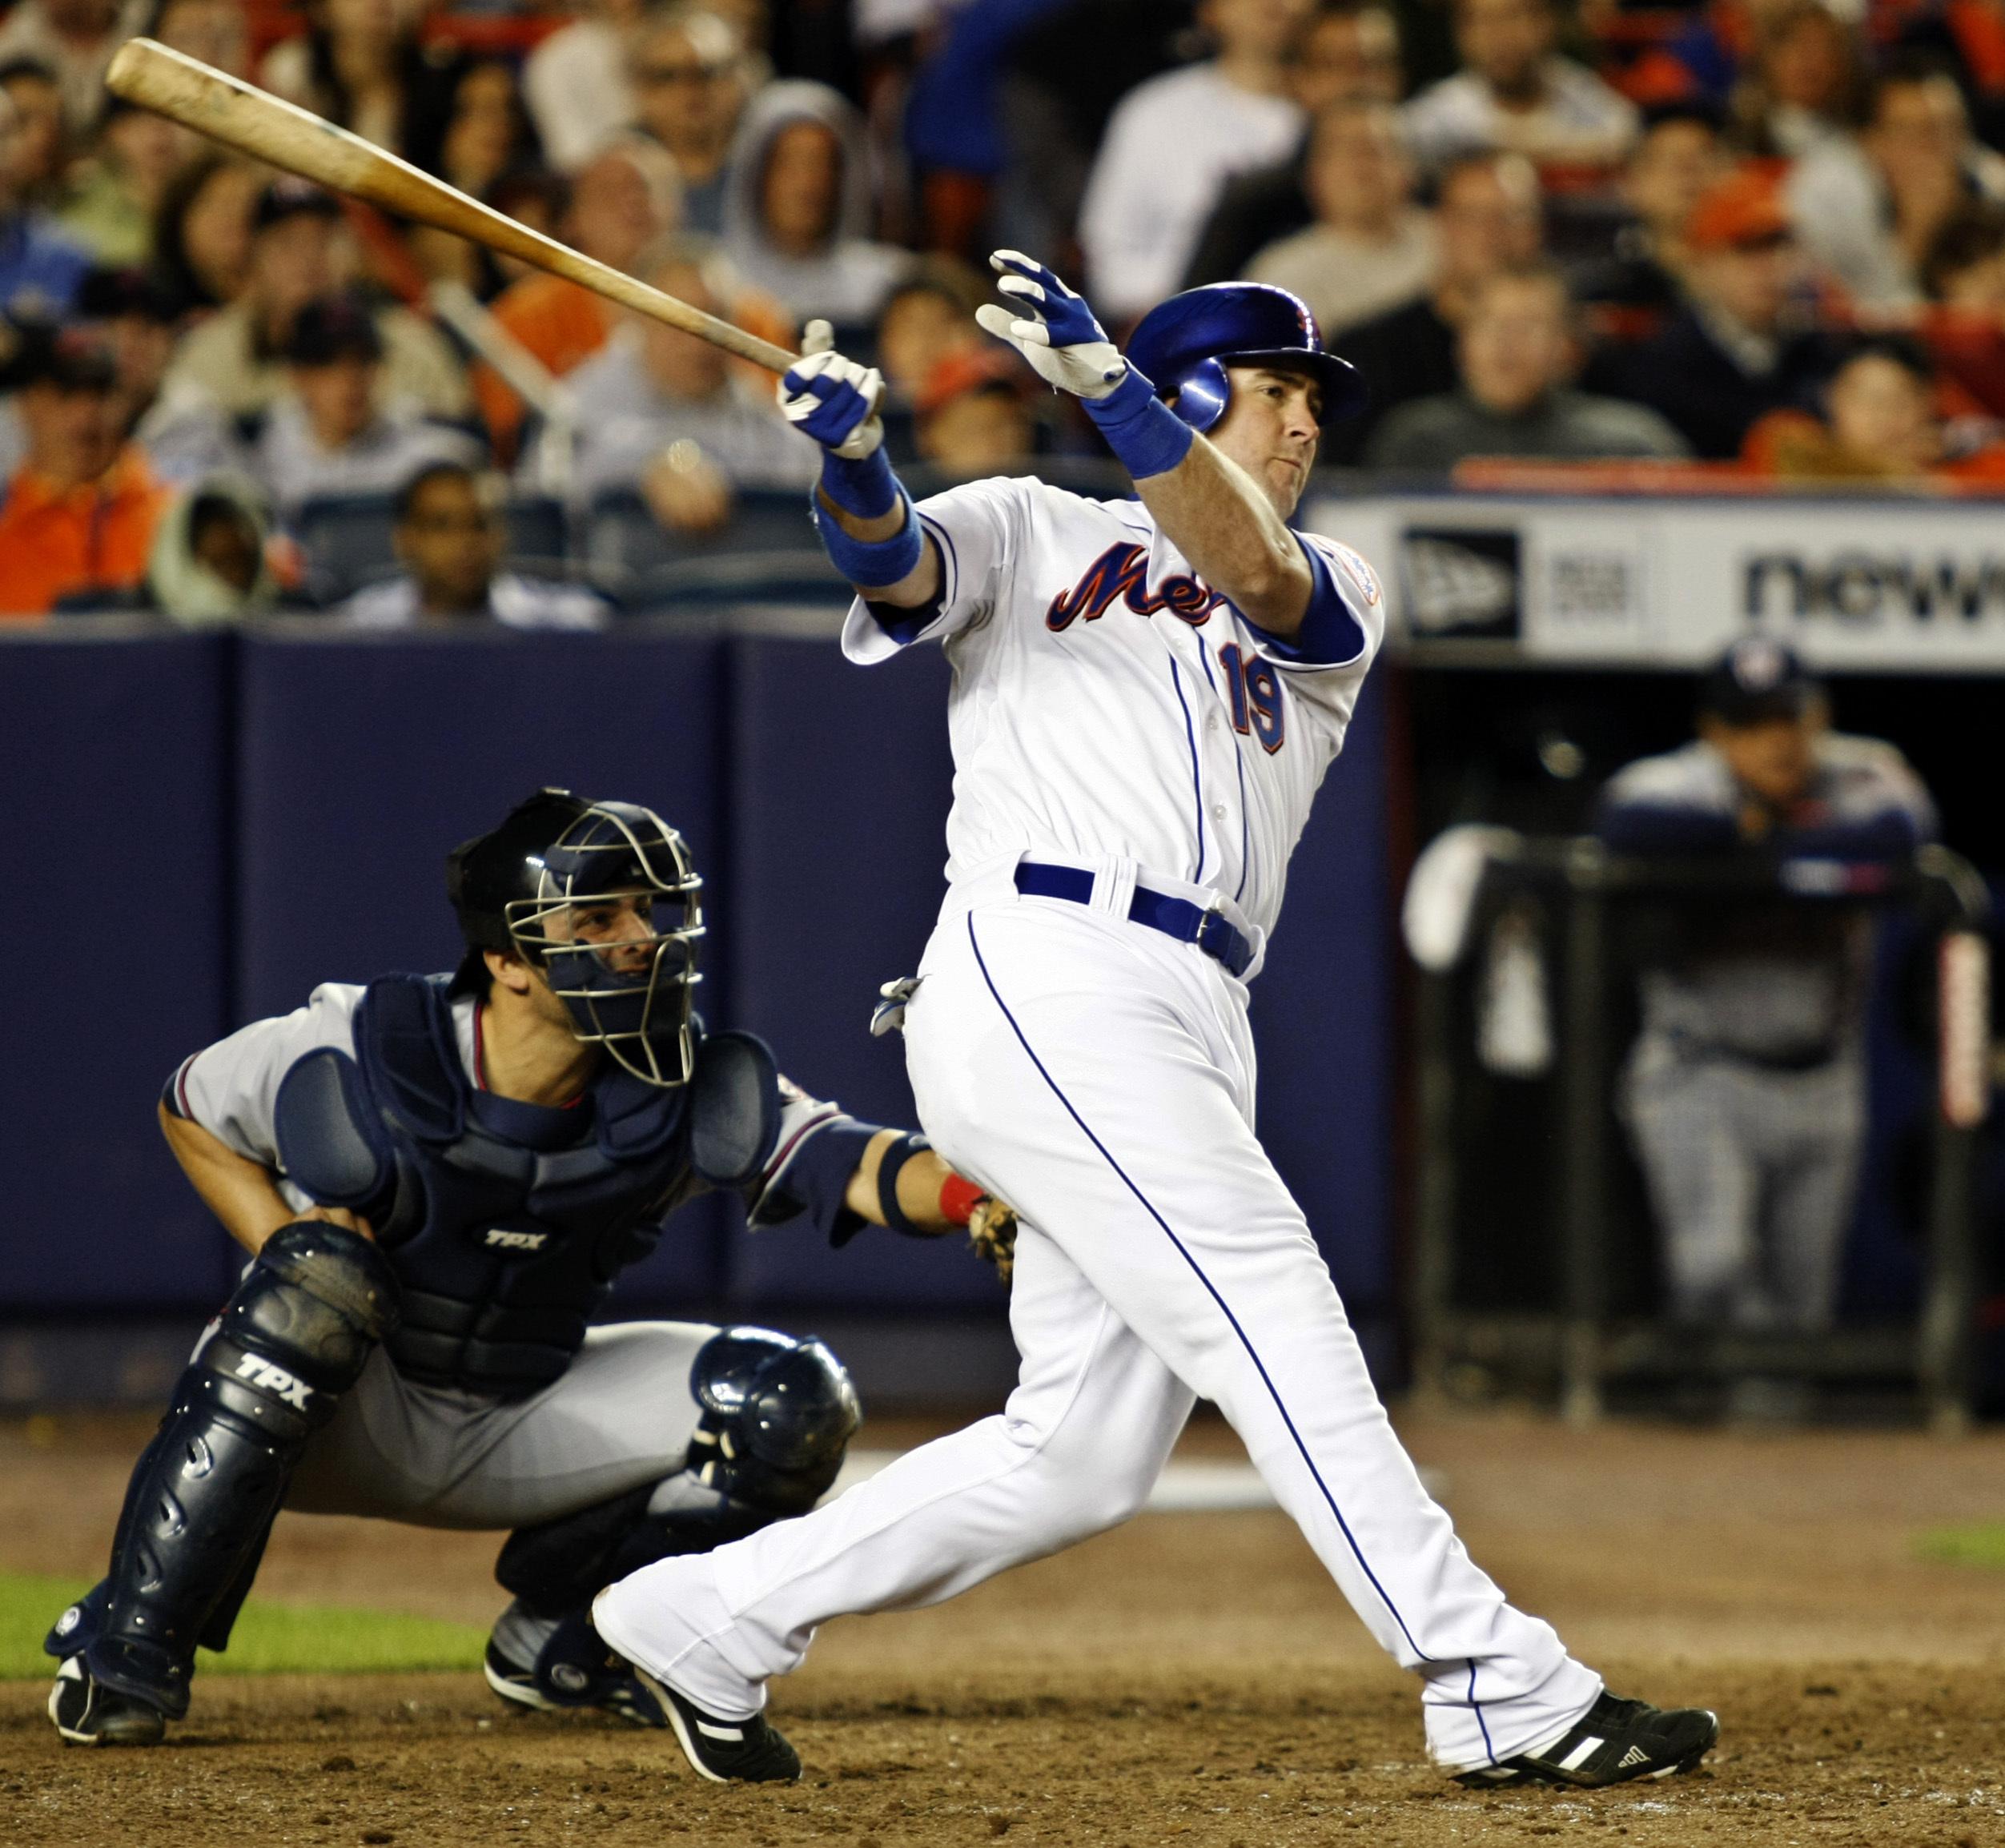 baseball mlb new york mets desktop 2504x2308 hd wallpaper 659068jpg 2504x2308